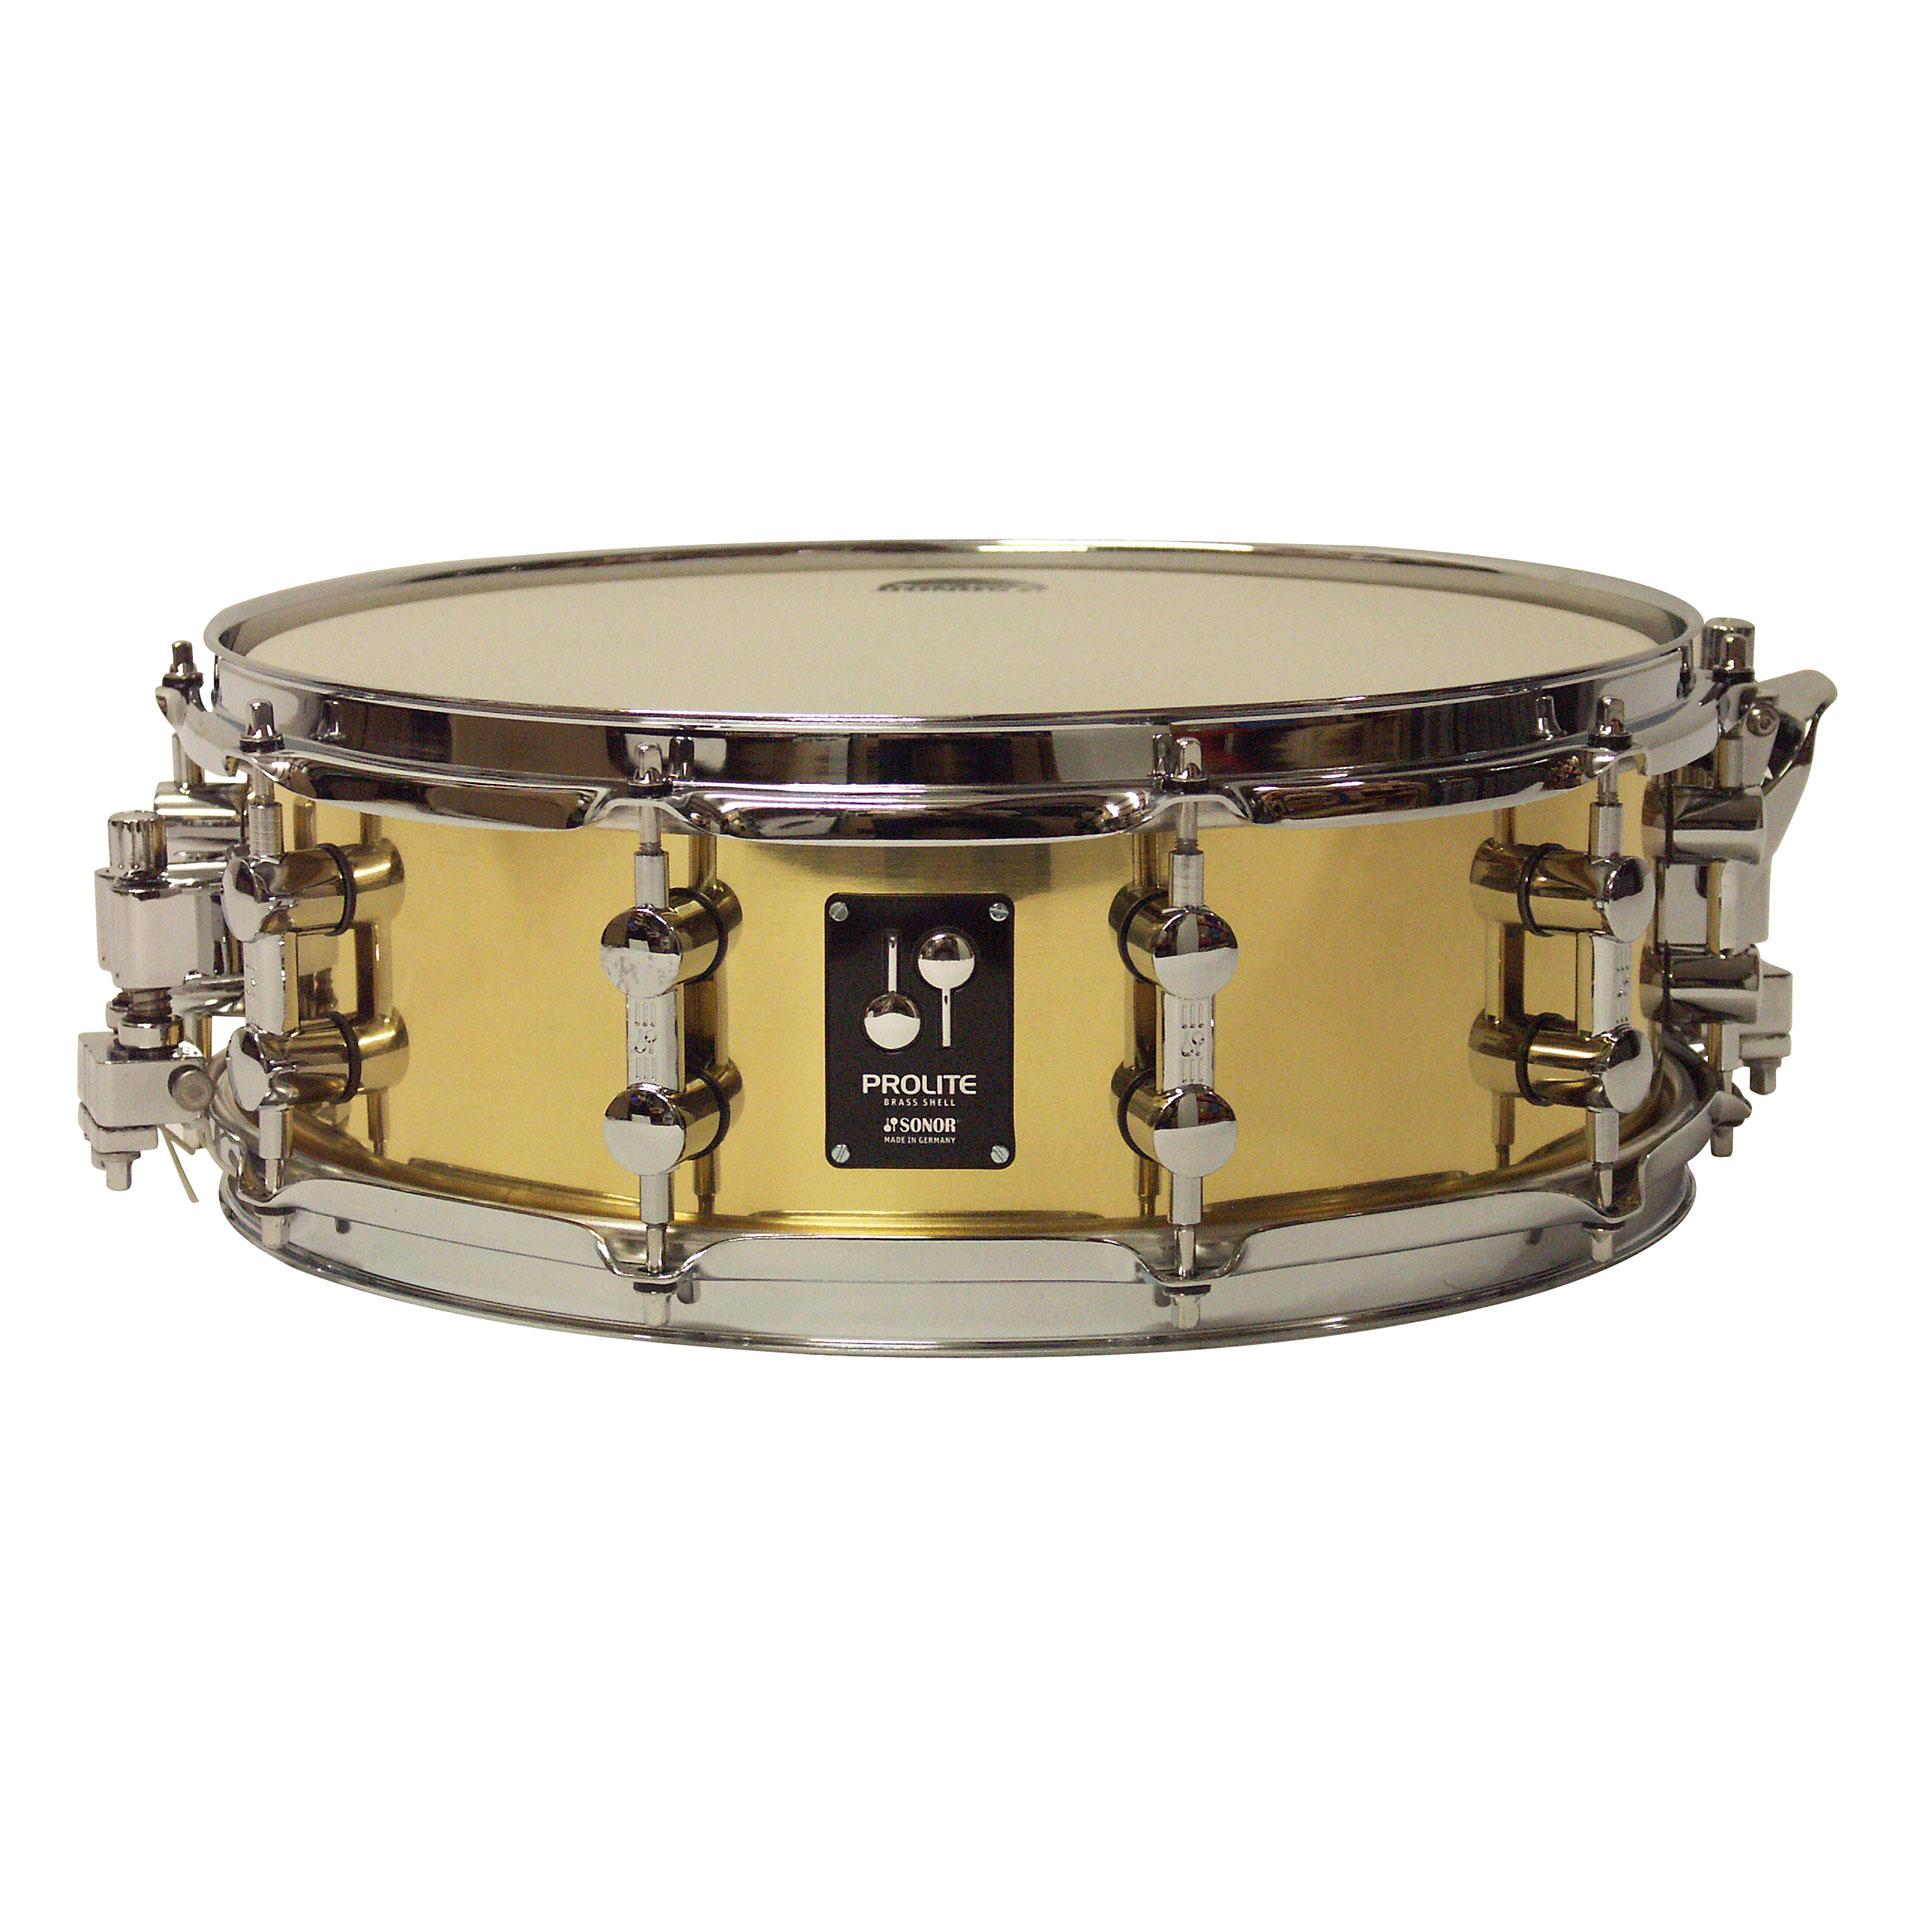 Sonor ProLite PL 12 1405 SDB « Snare Drum